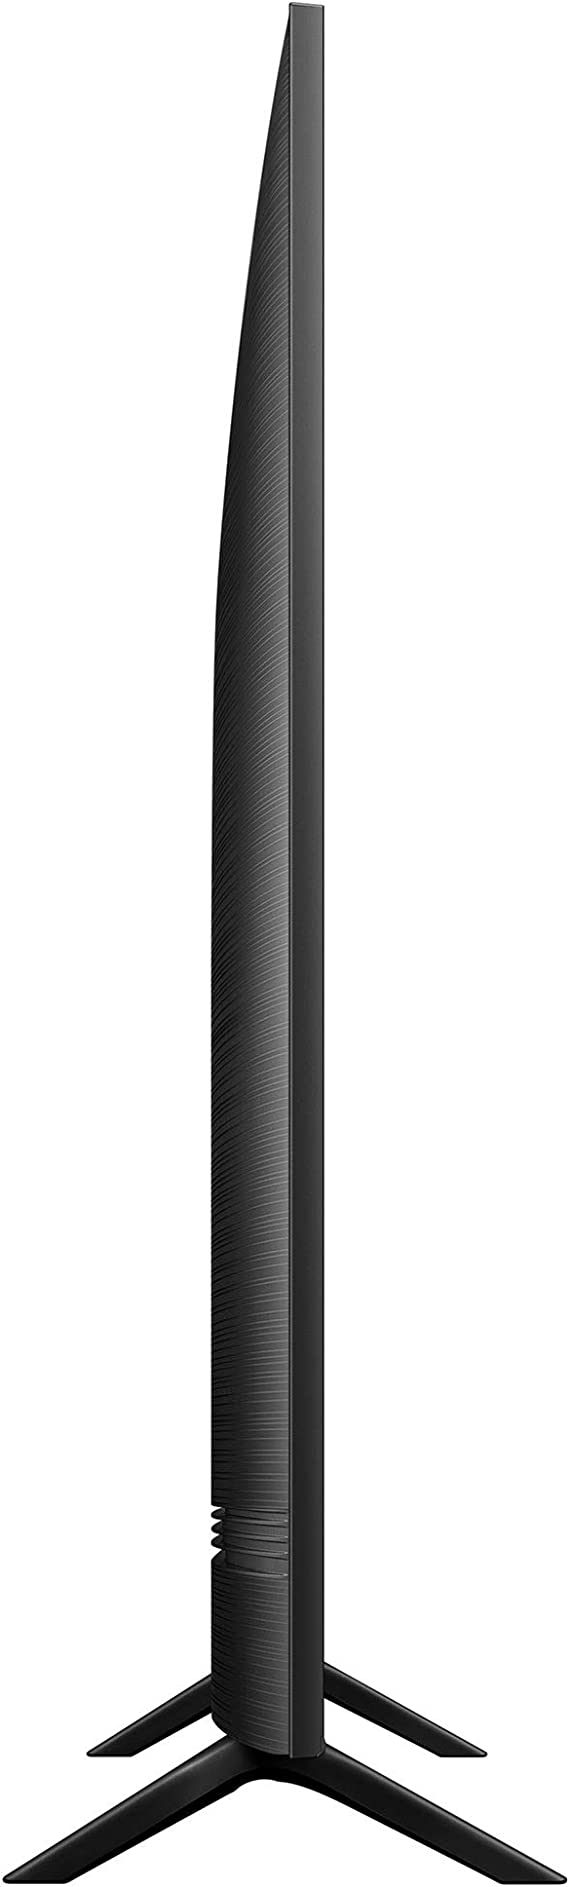 Samsung 2020 43 pulgadas Q60T QLED 4K Quantum HDR Smart TV con sistema operativo Tizen: Amazon.es: Electrónica